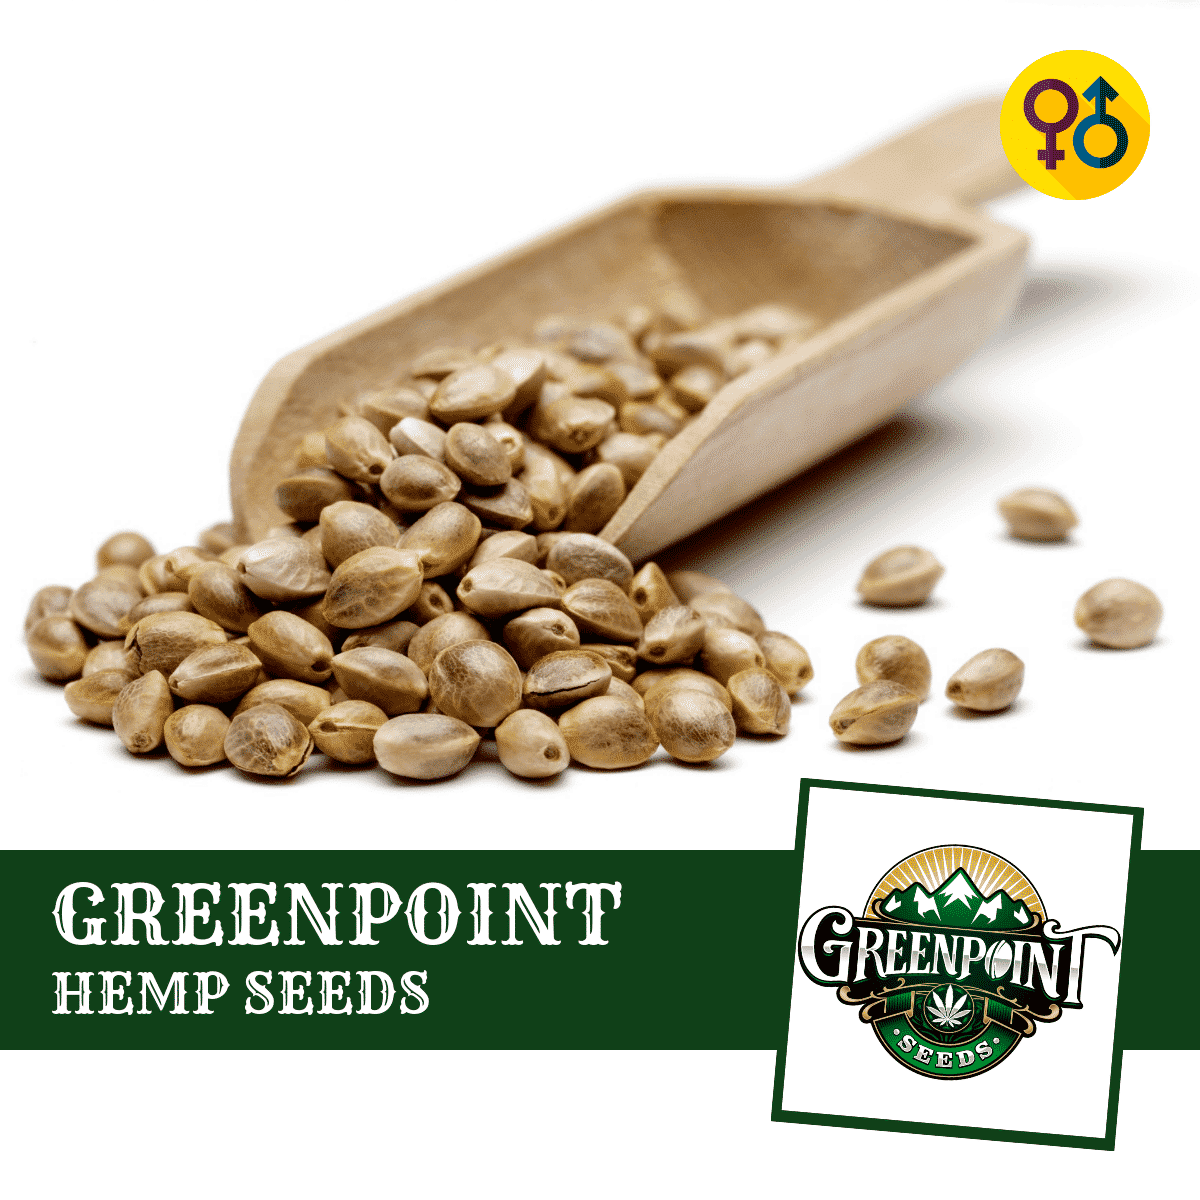 Buy Cannabis Seeds Online - Greenpoint Seeds - Feminized, Regular and Autoflower Marijuana Seeds and Genetics